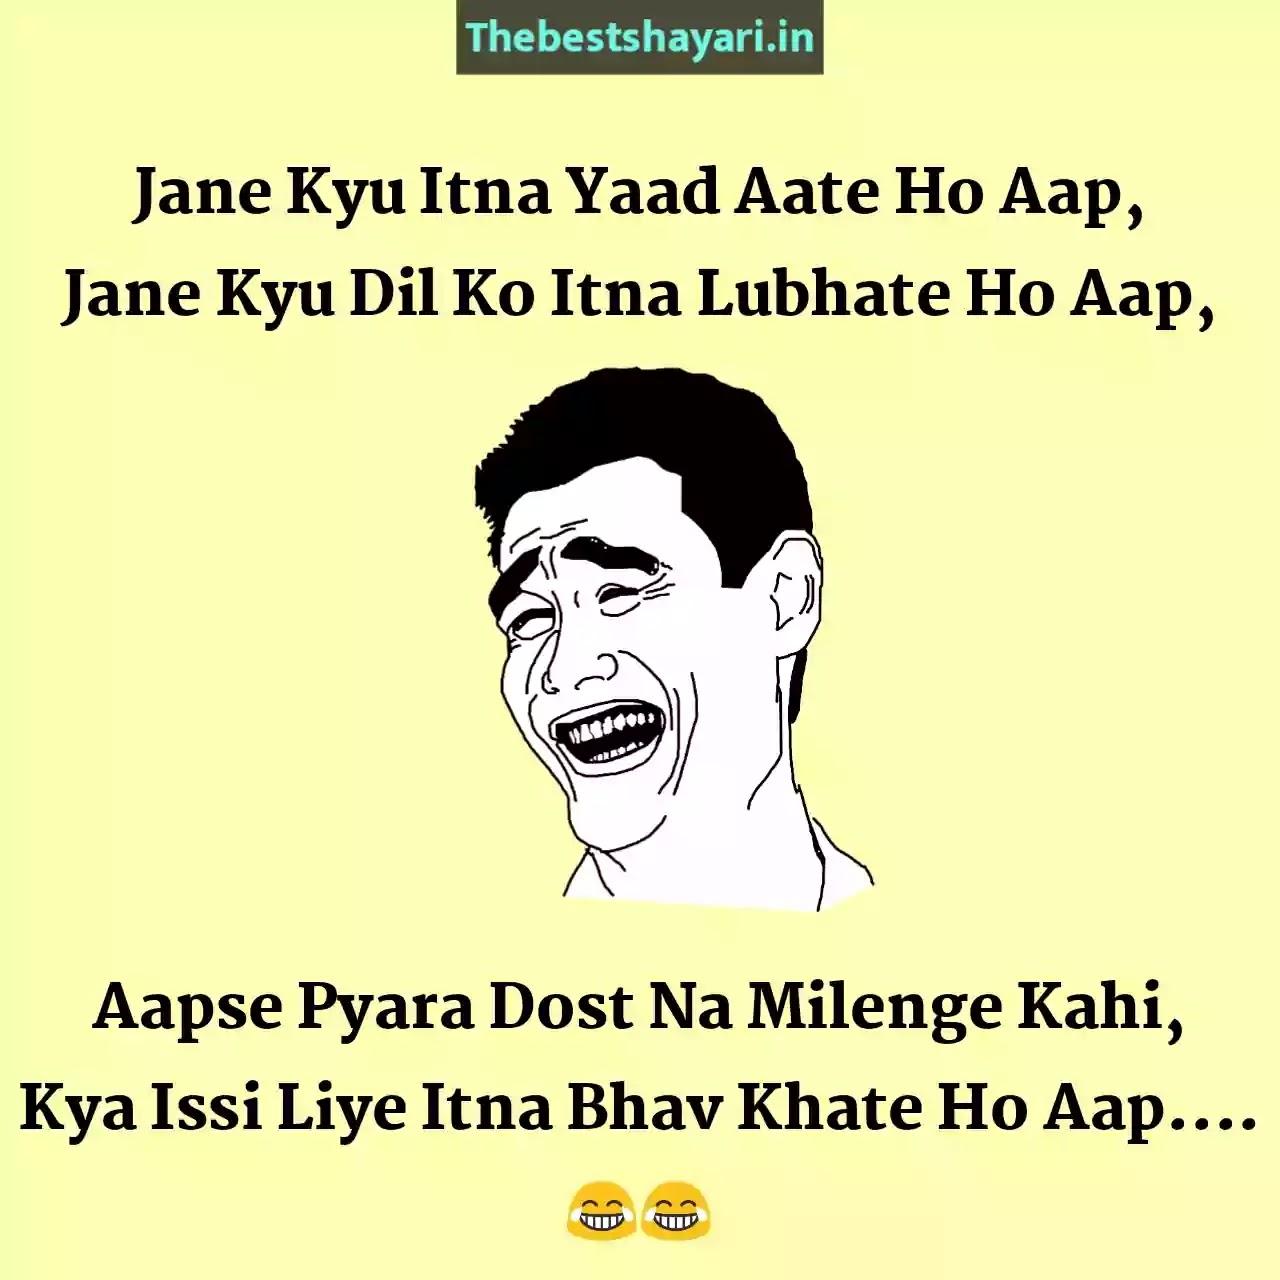 Funny shayari on friends in Hindi